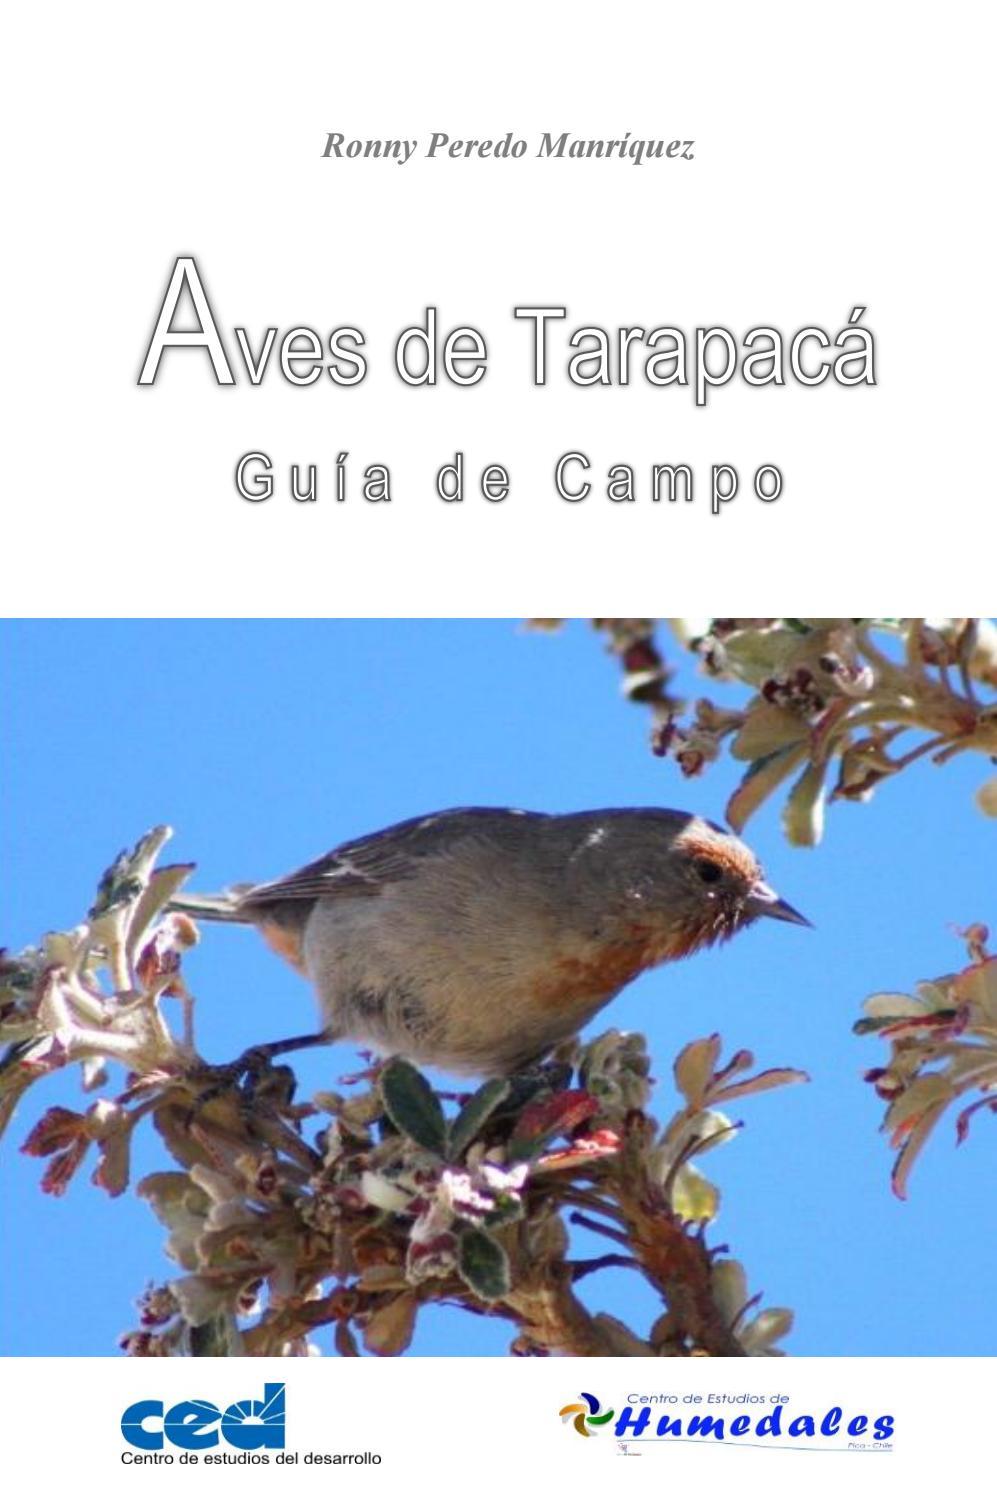 Guia aves de tarapacá r peredo by Esteban Espinoza Ansieta - issuu